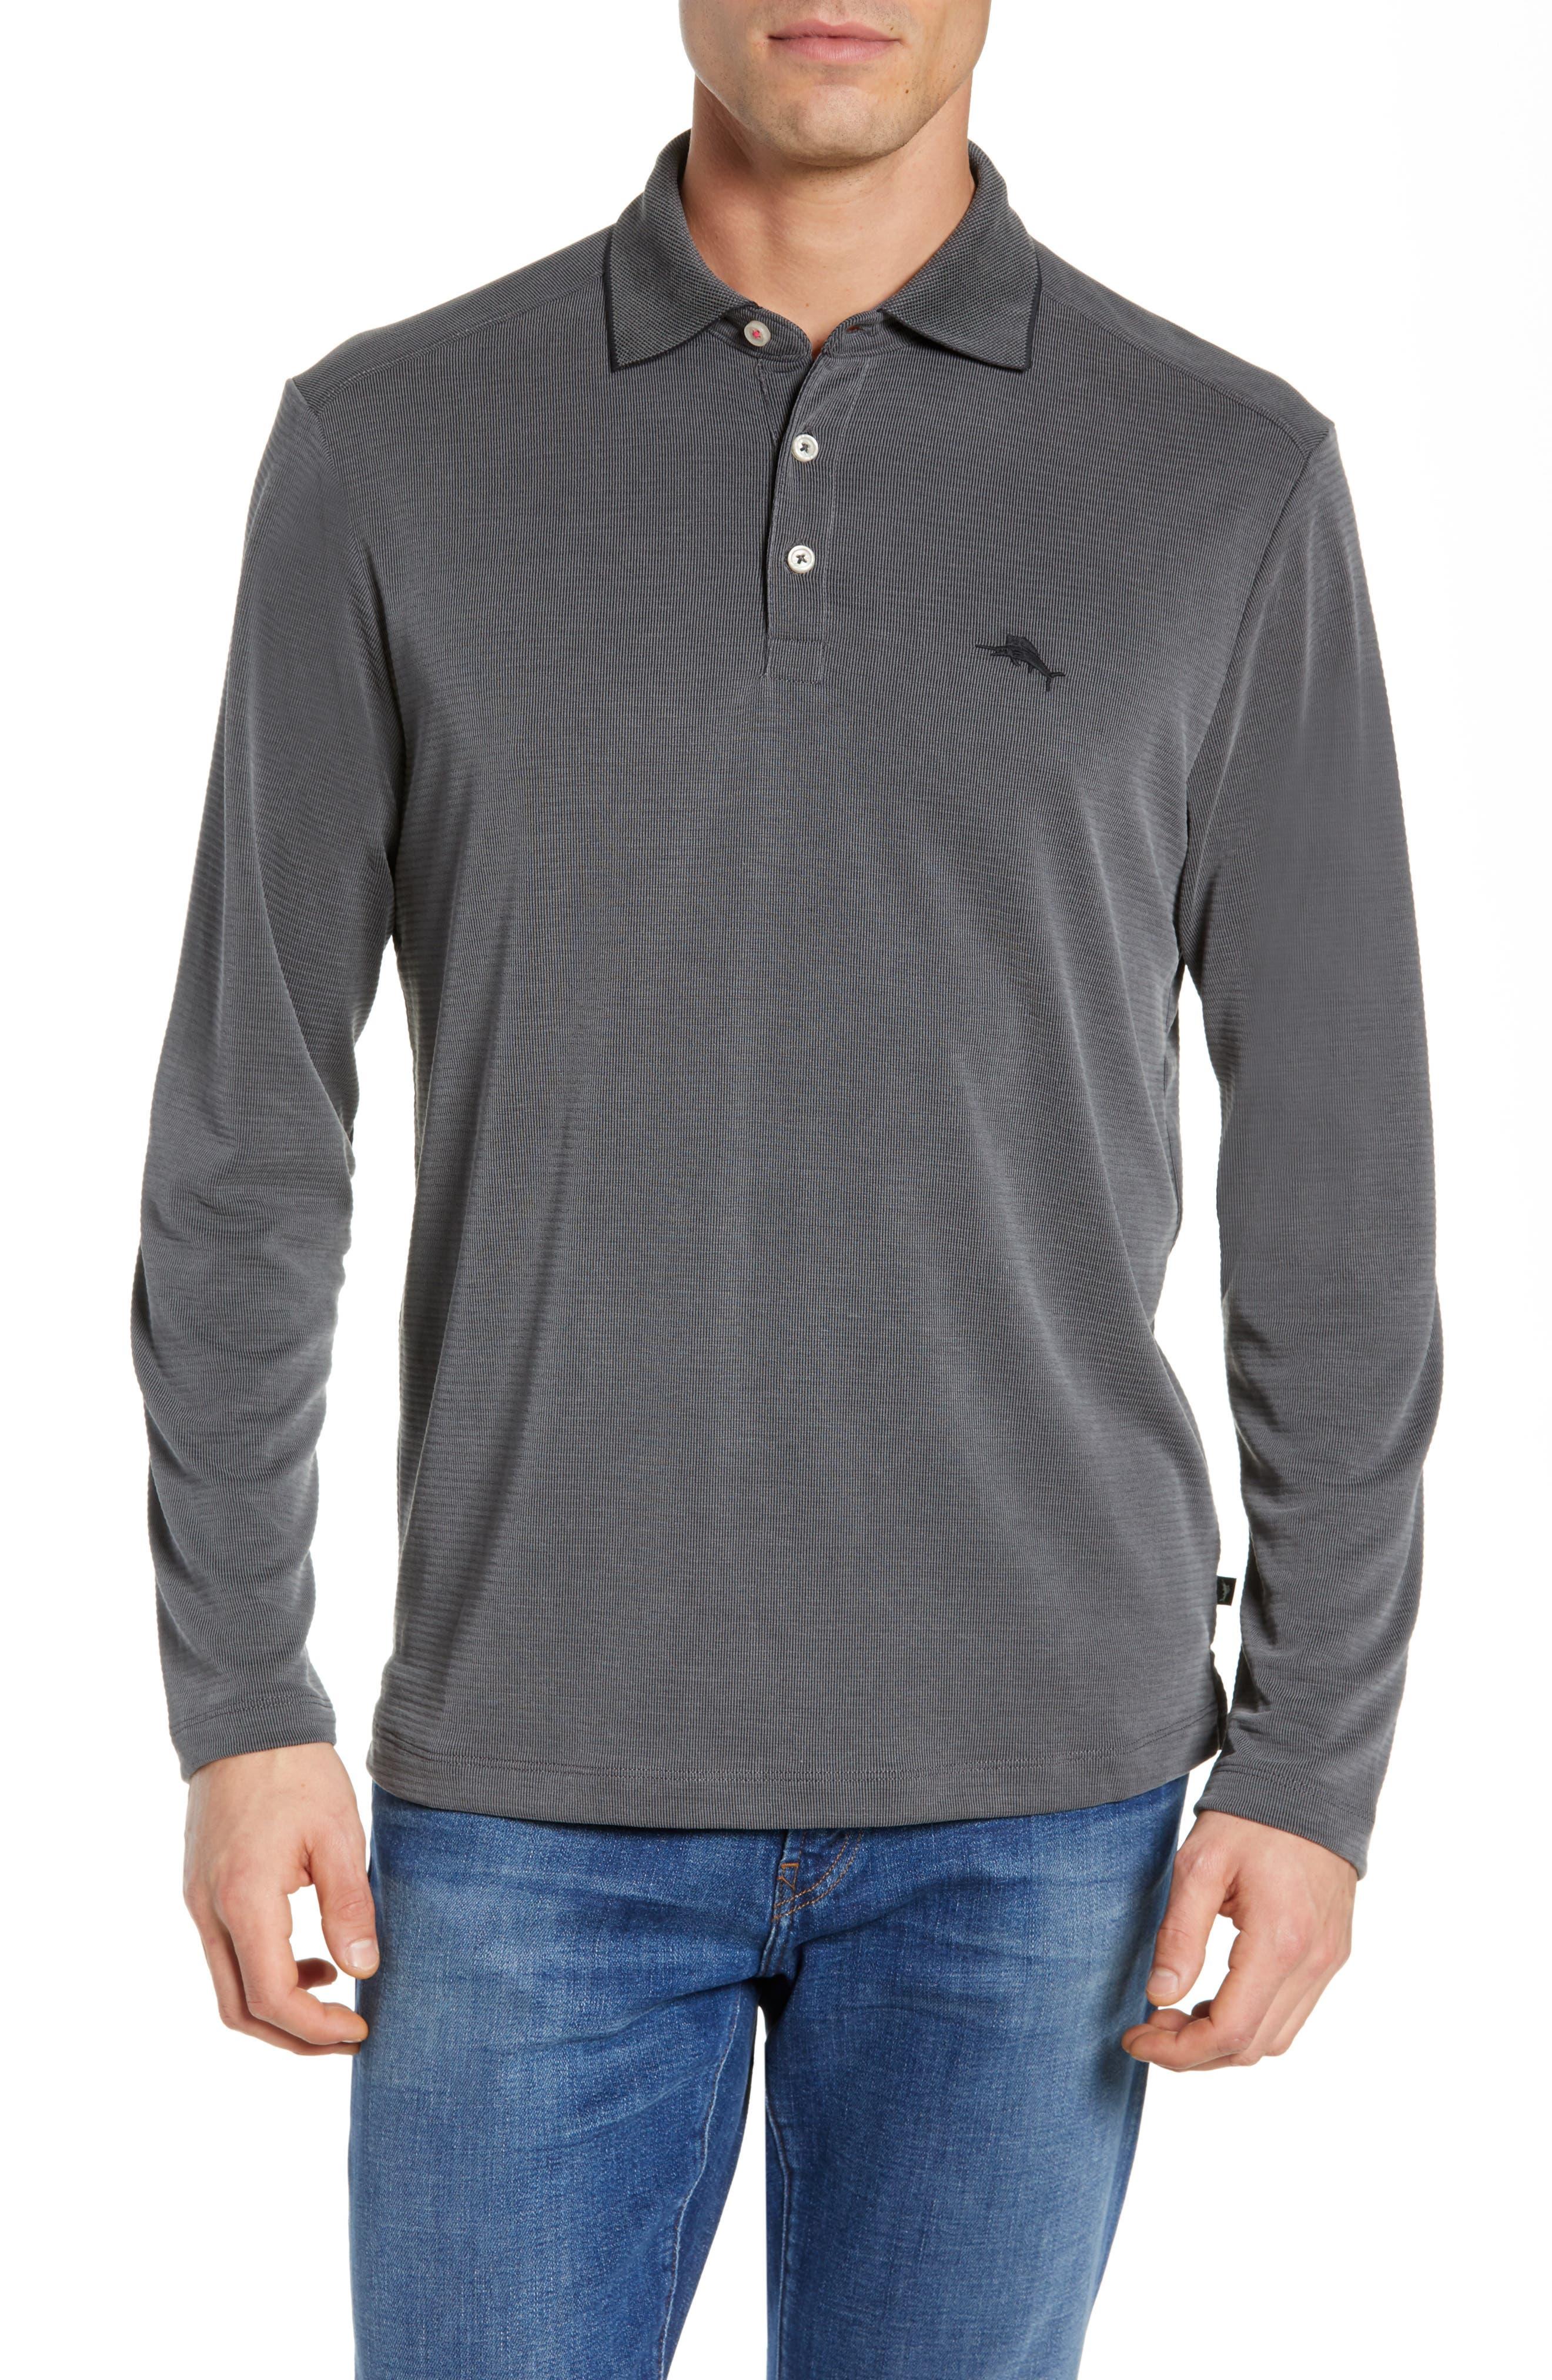 TOMMY BAHAMA Coastal Crest Regular Fit Polo, Main, color, BLACK